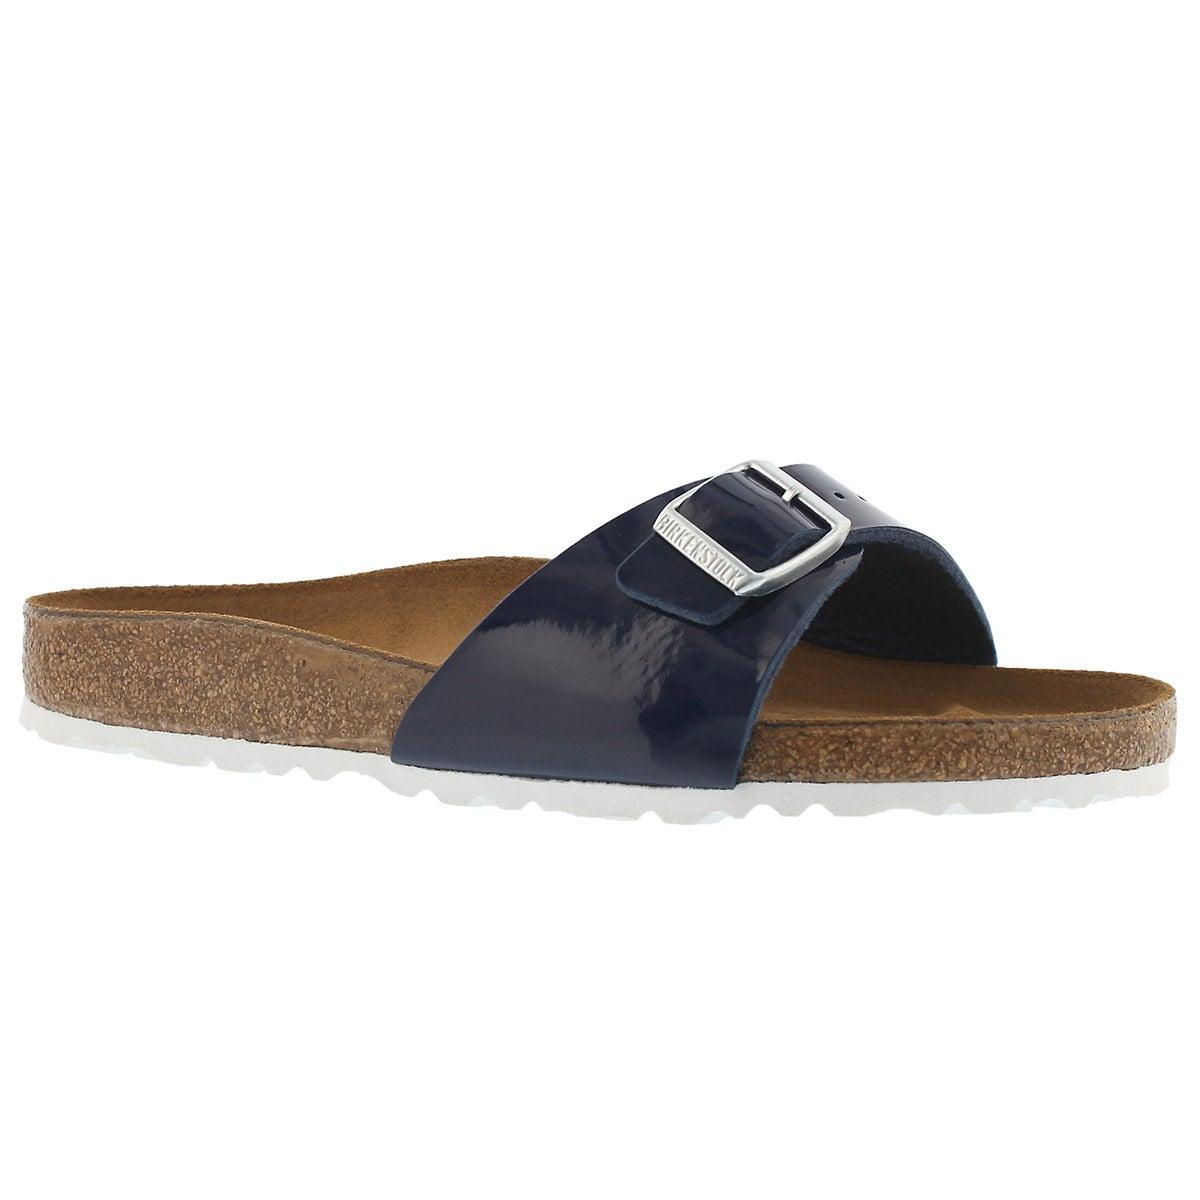 Women's MADRID blue dress BF 1 strap sandals